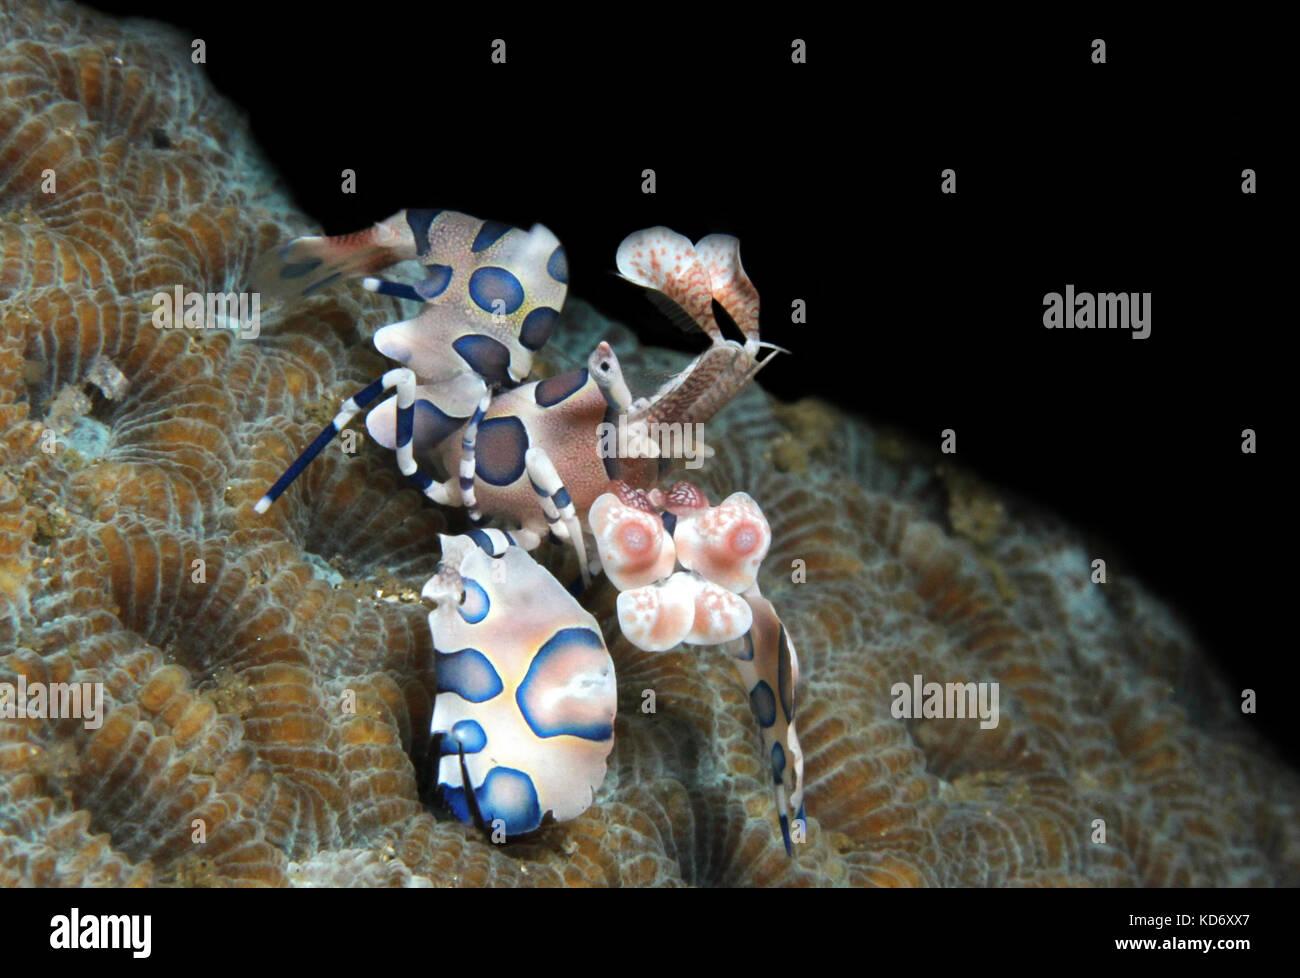 Harlequin Shrimp (Hymenocera Elegans), Lembeh Strait, Indonesia - Stock Image